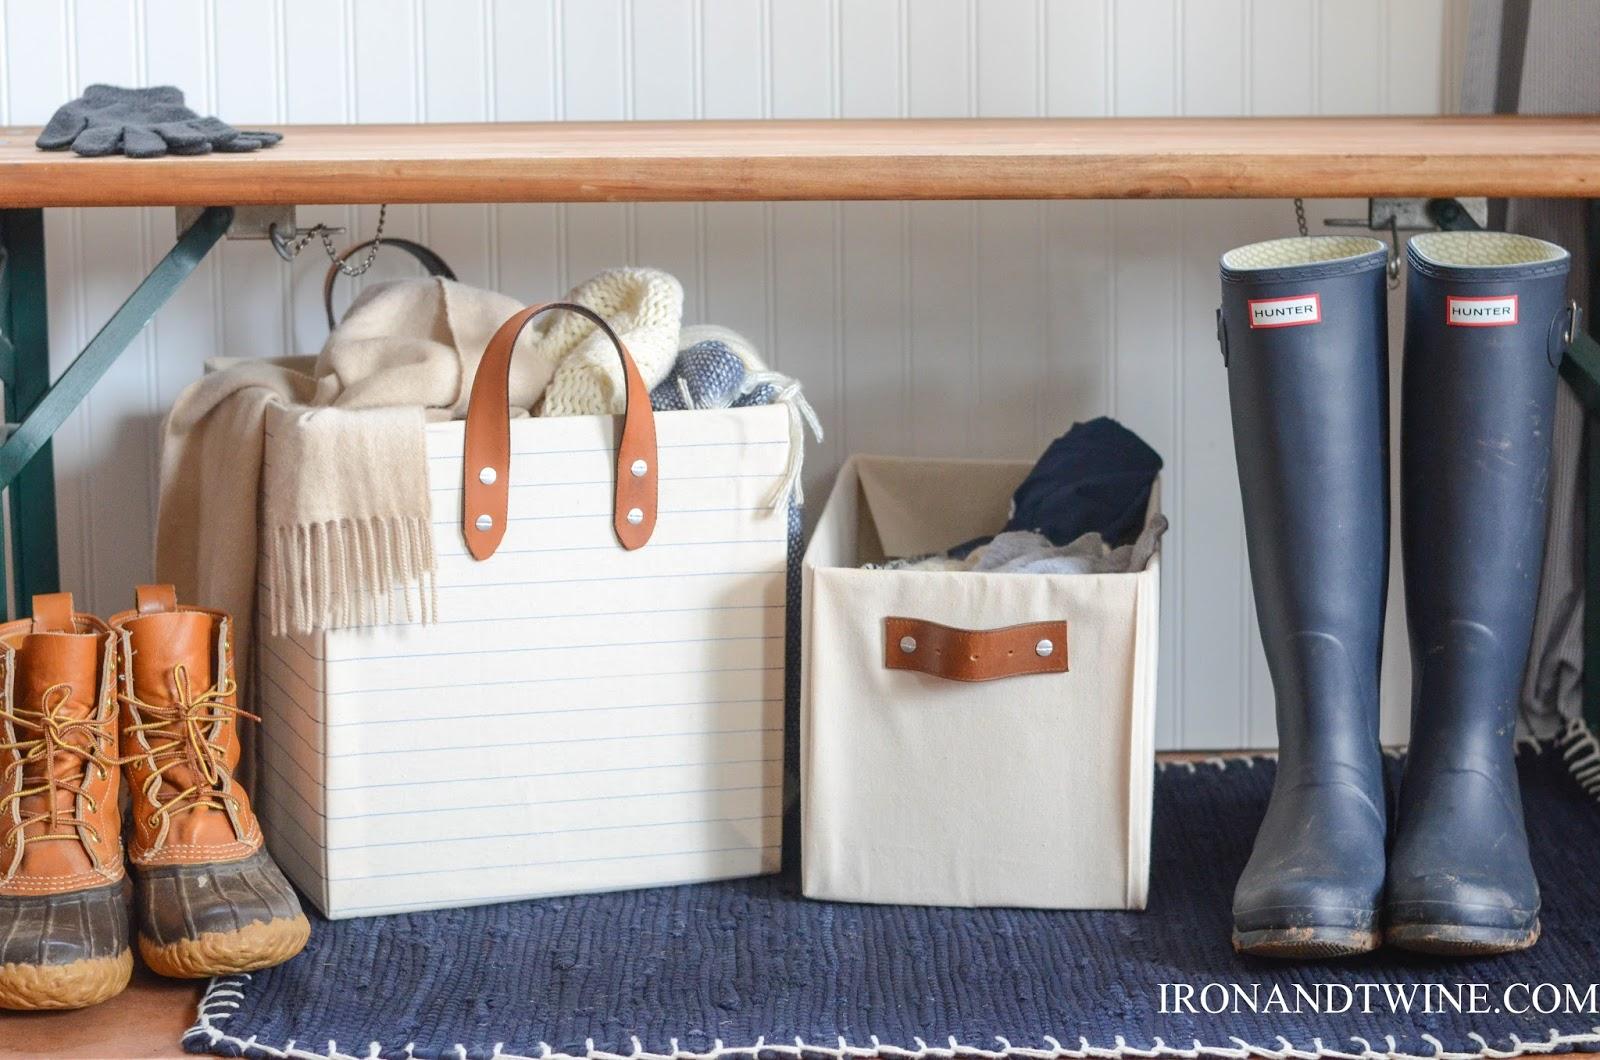 DIY+Belt+Handled+Box,+DIY+fabric+covered+box,+Iron+and+Twine+(1).jpg